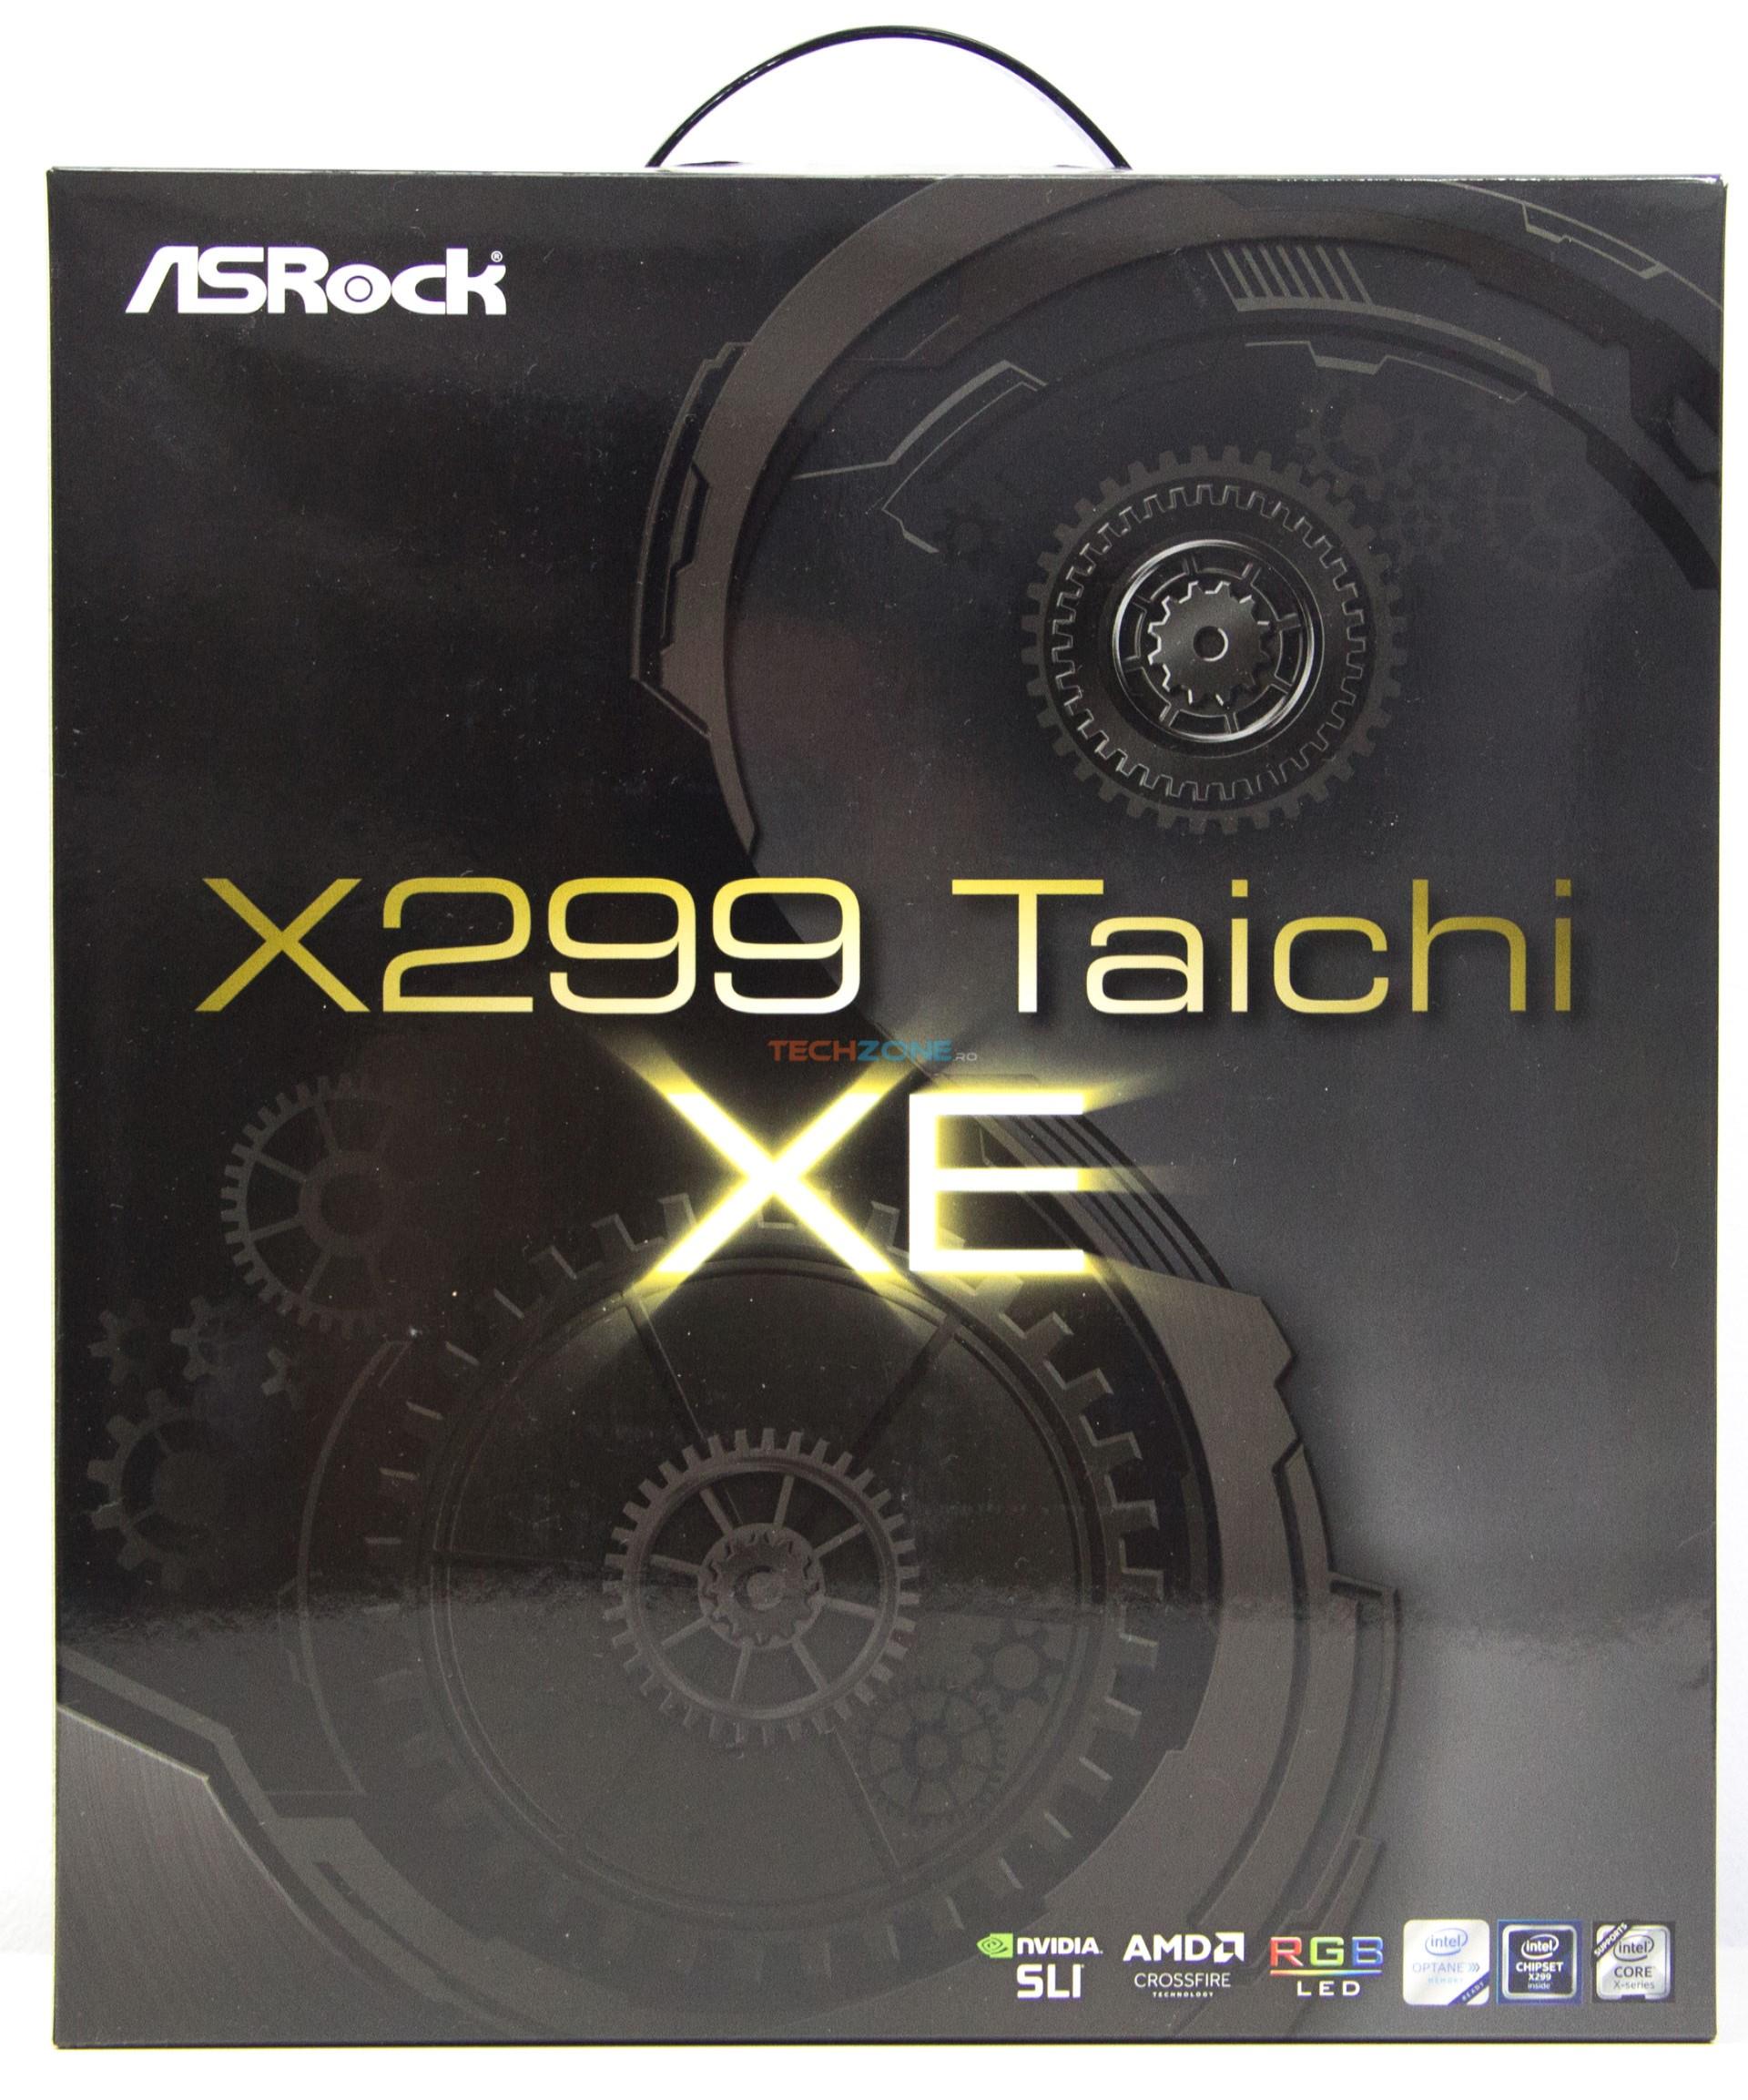 ASRock X299 Taichi XE box